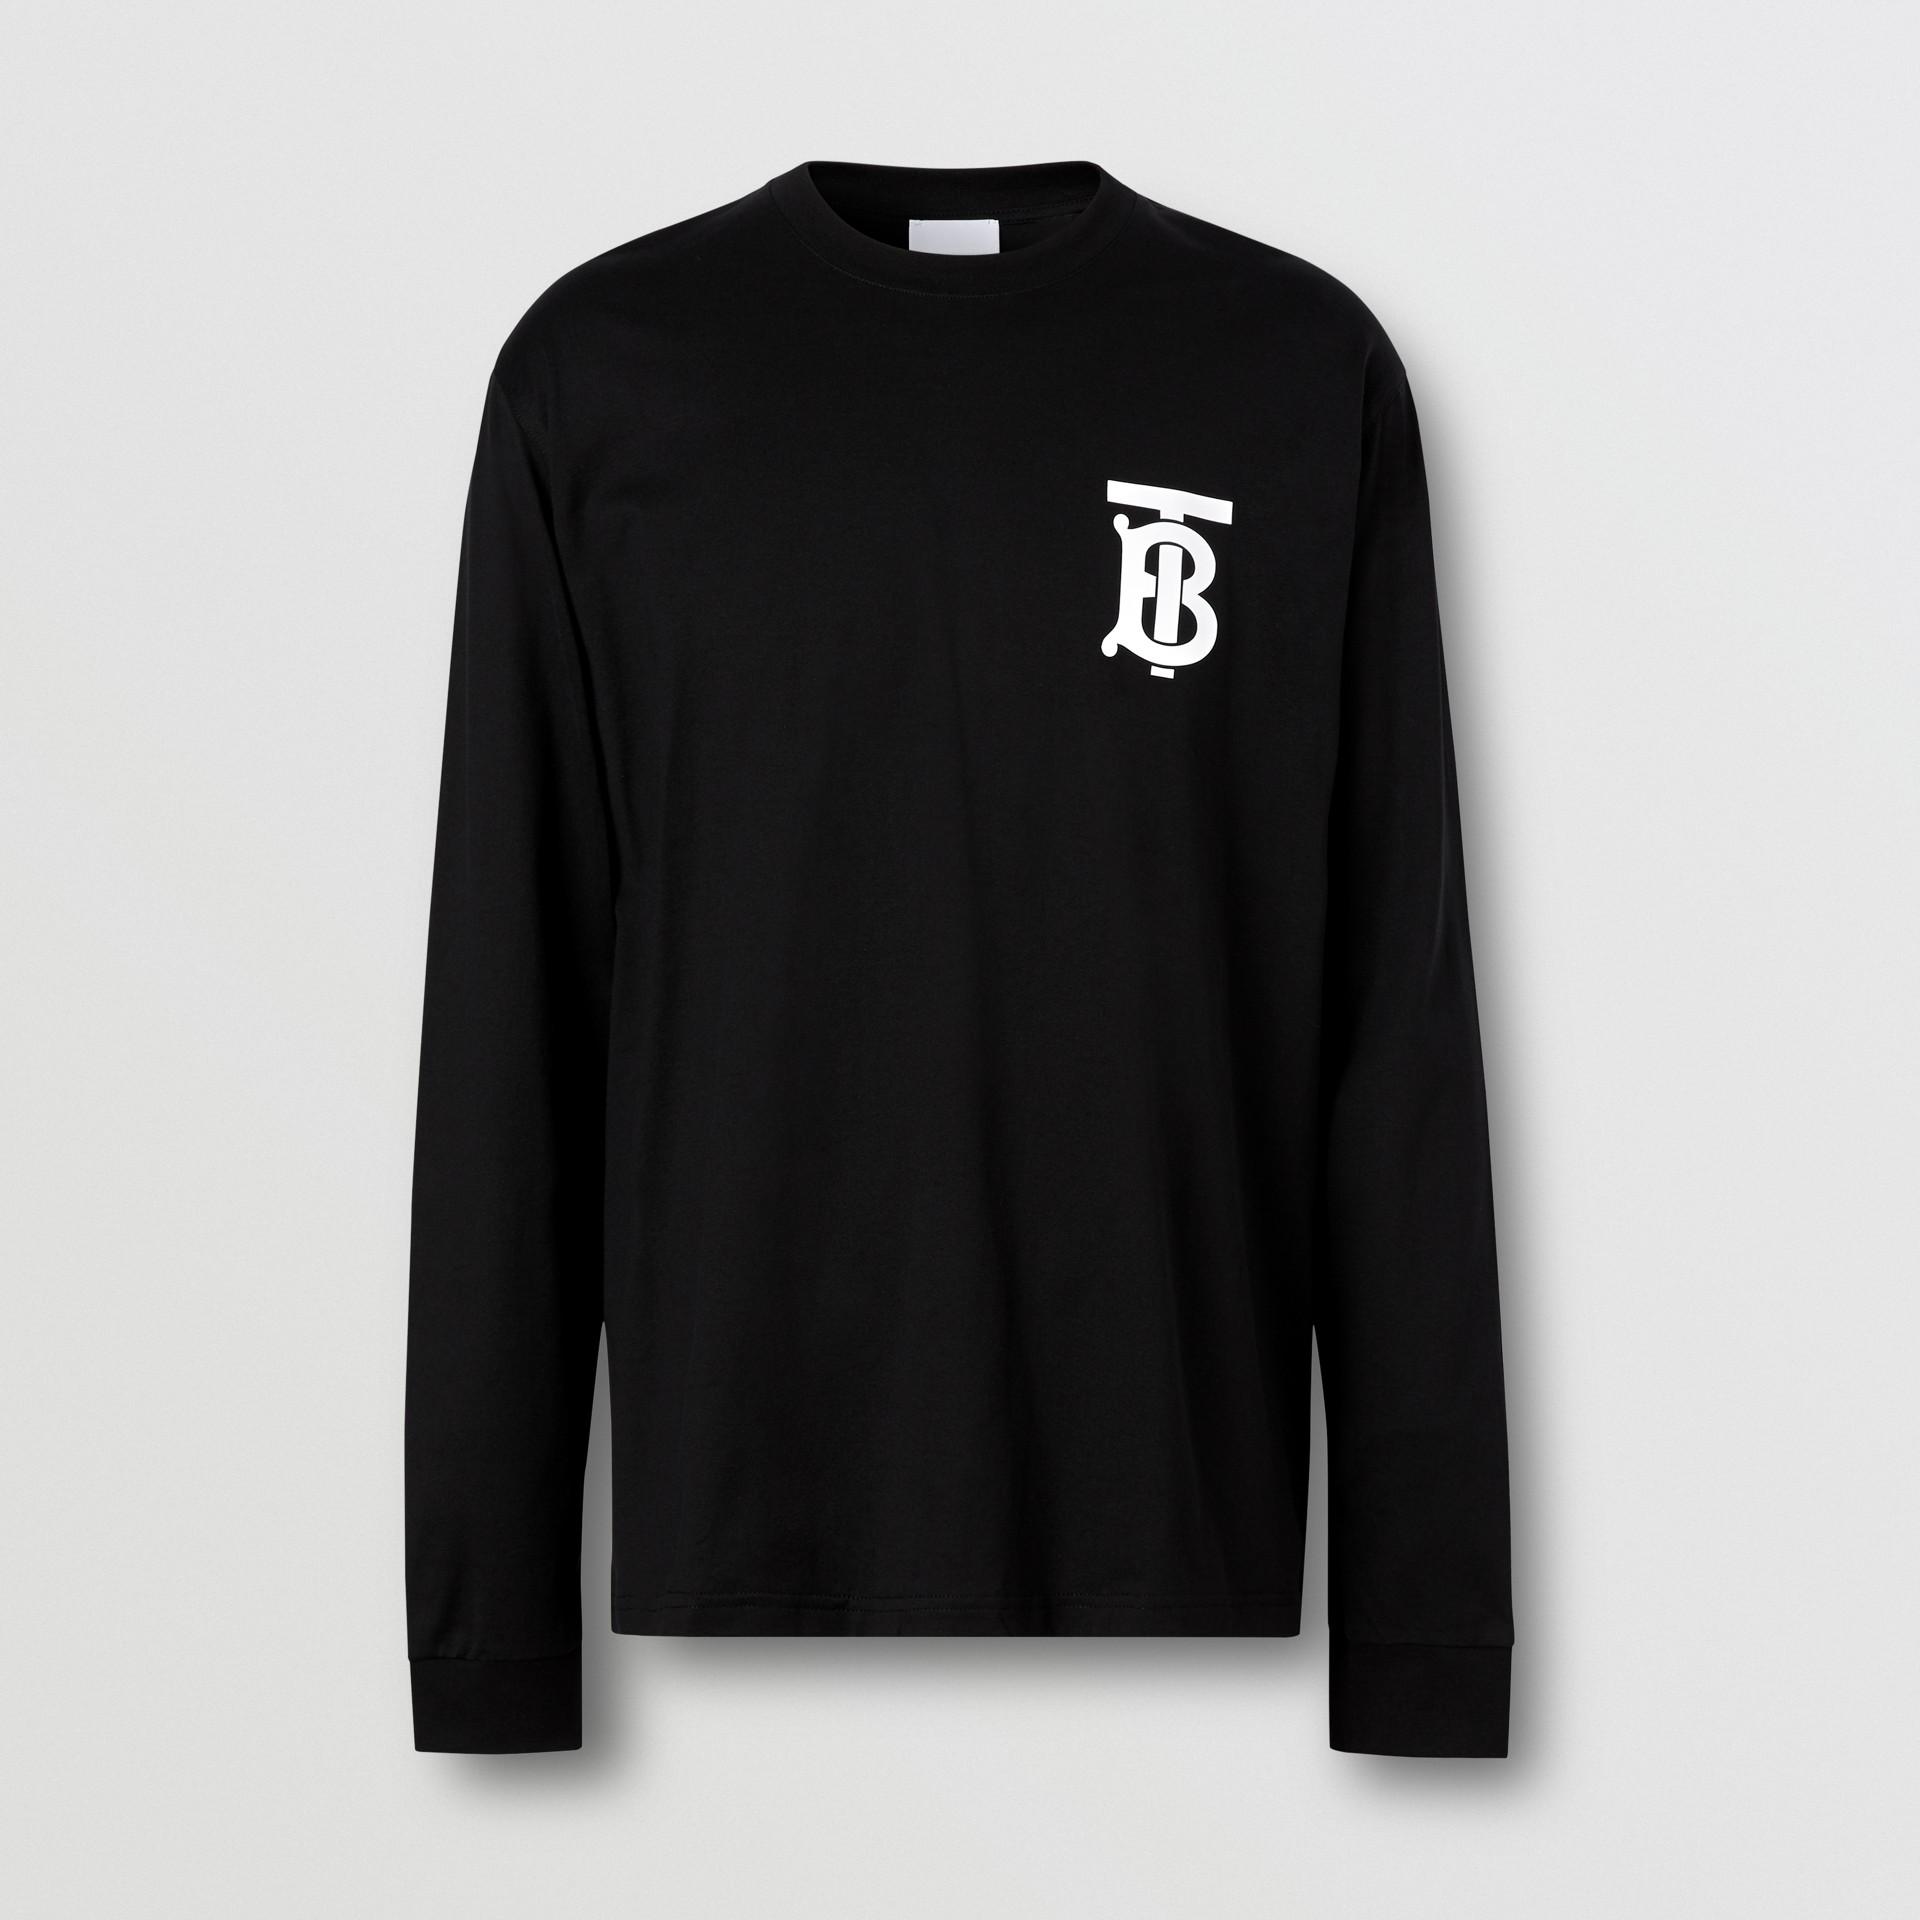 Long-sleeve Monogram Motif Cotton Top in Black - Men | Burberry - gallery image 3